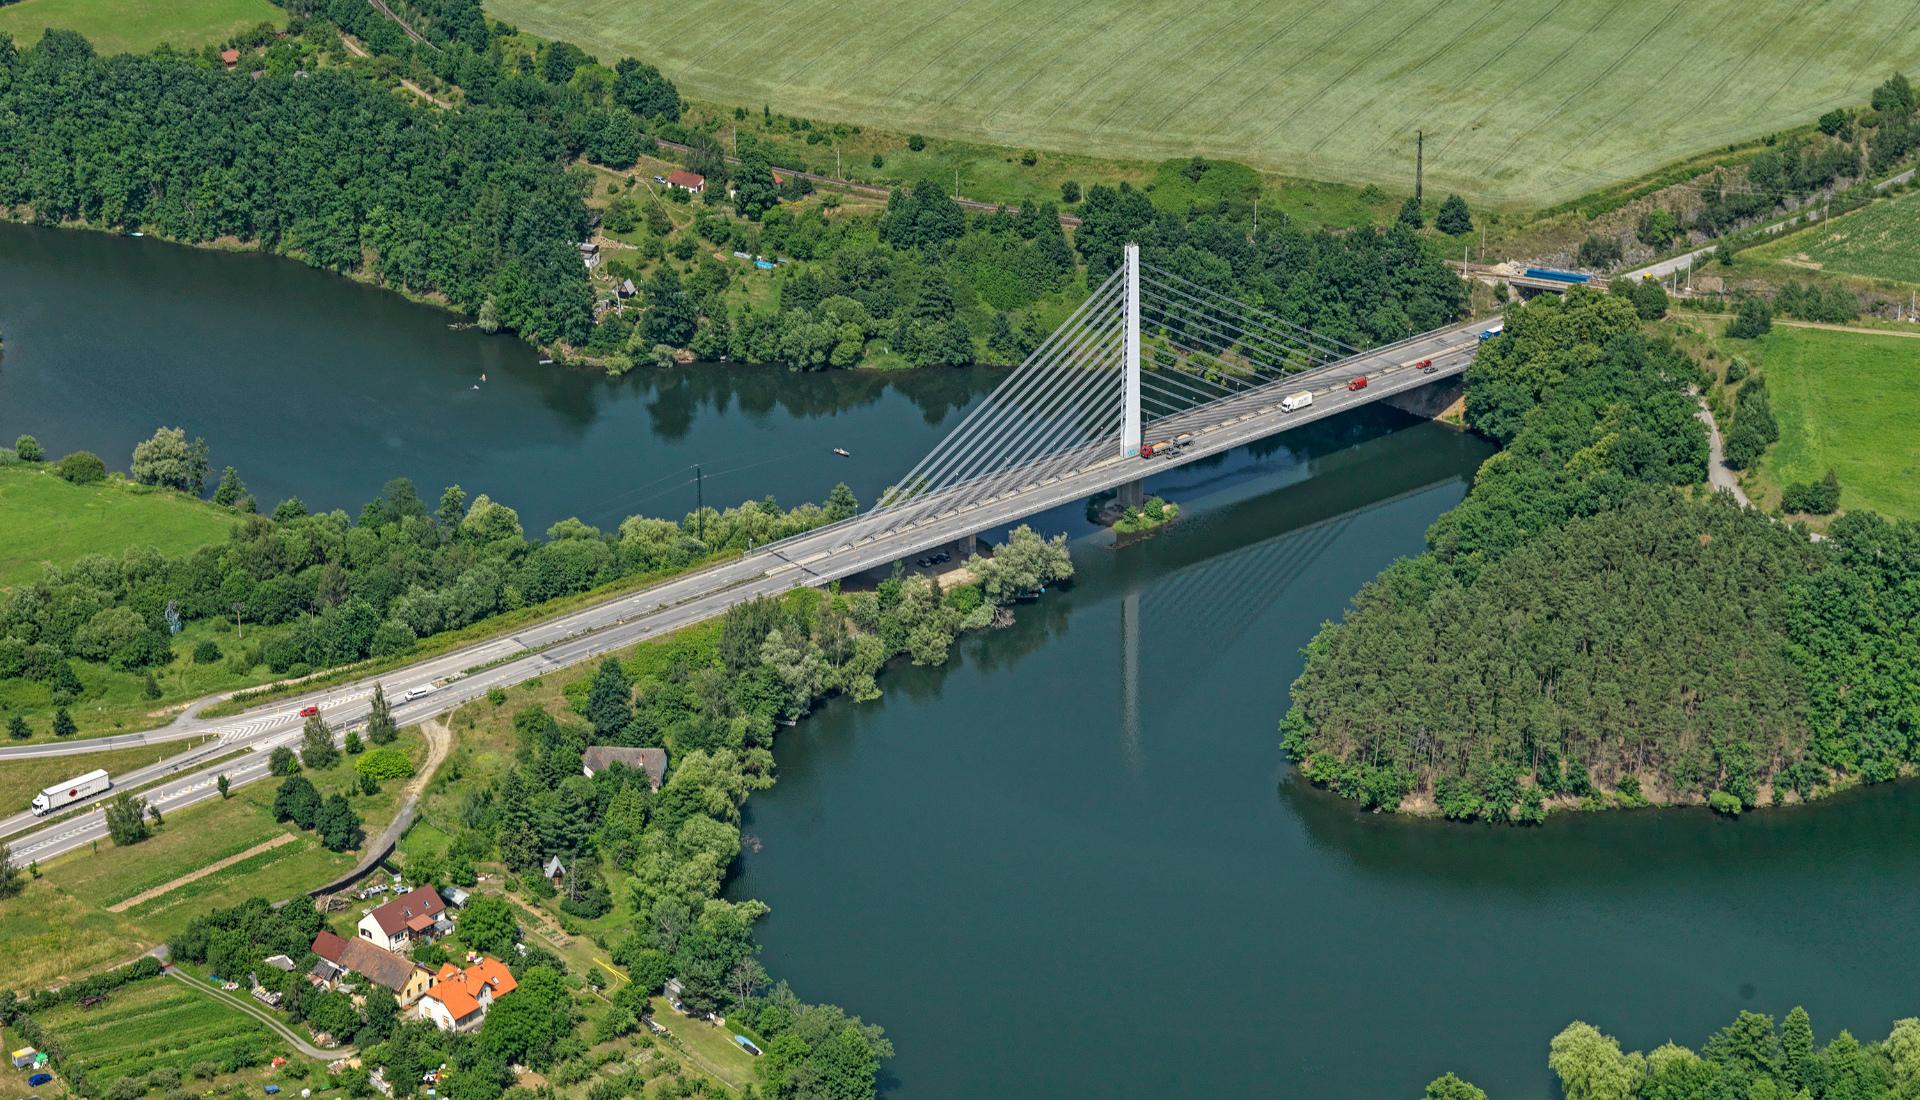 Lanový vysutý most Tábor - Letova fotografie - Miroslav Kamrla - 2- 1920x1110_4